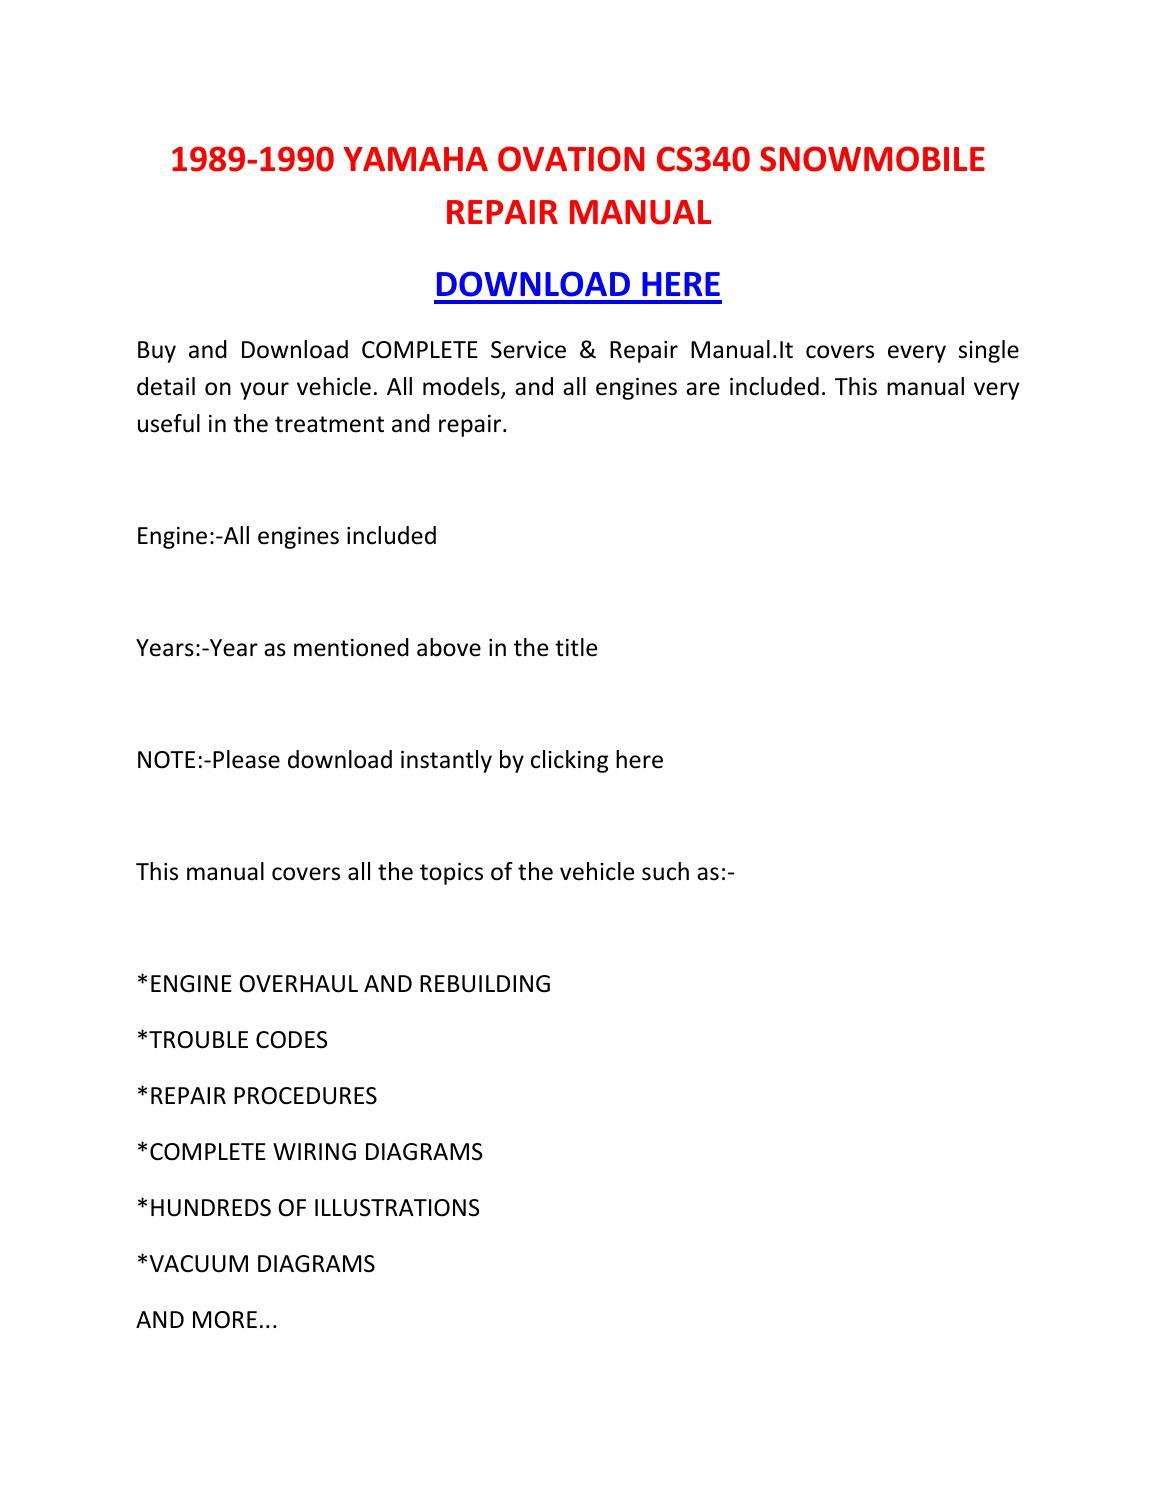 hight resolution of 1989 1990 yamaha ovation cs340 snowmobile repair manual